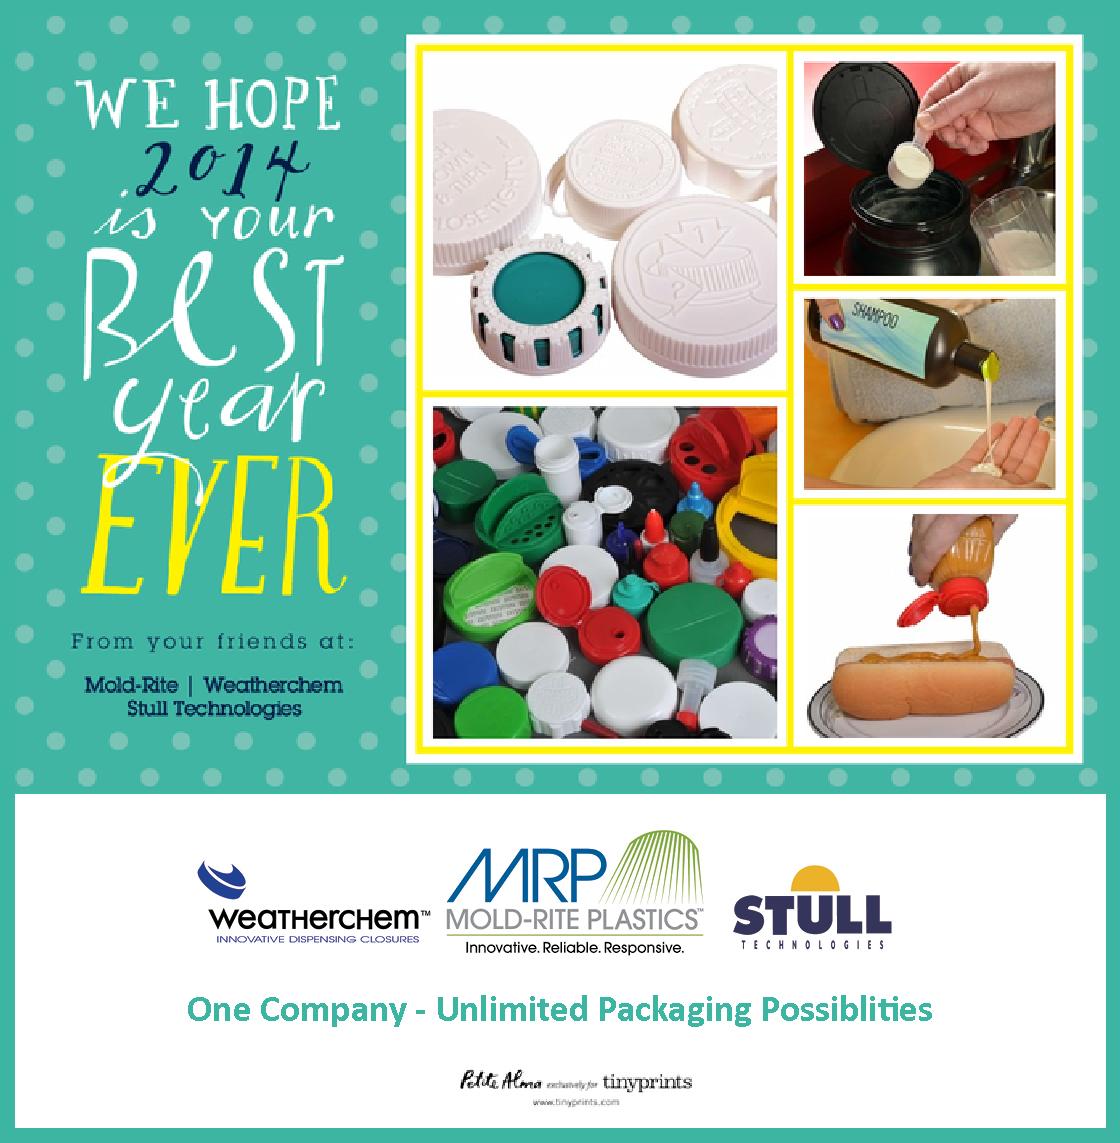 Holiday Greetings From Weatherchem, Stull Tech, & Mold-Rite Plastics